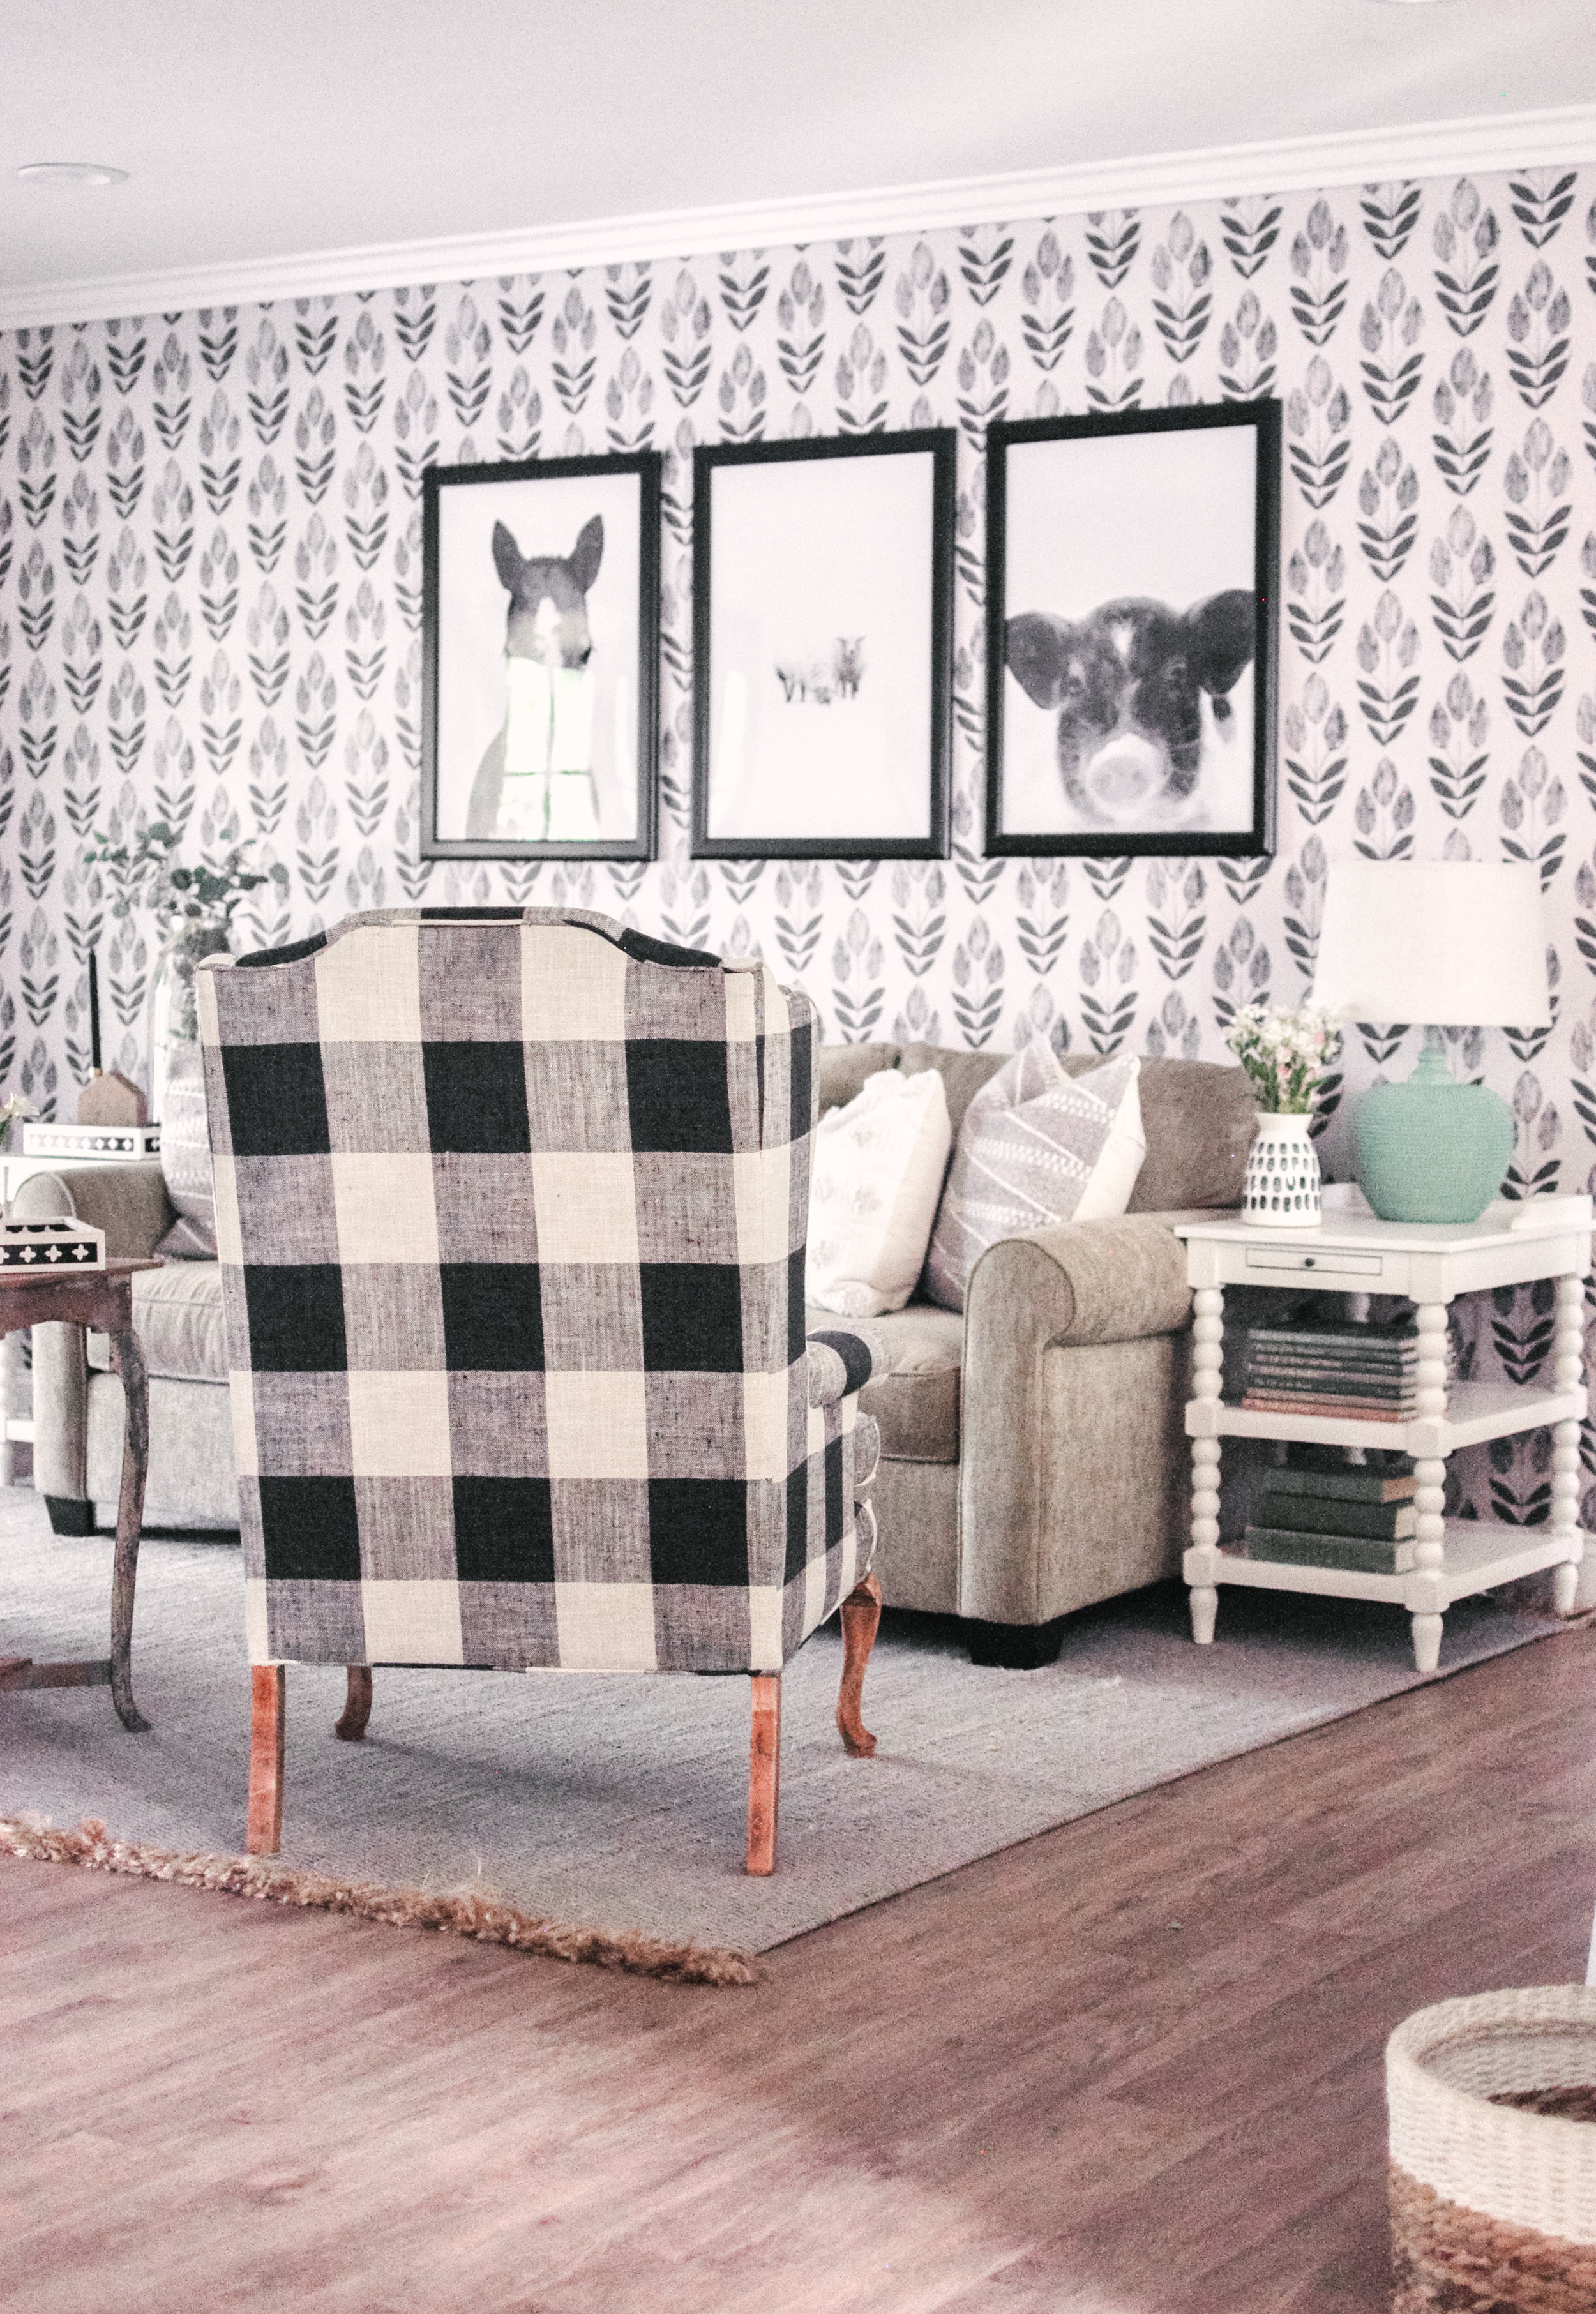 Black and White Scandinavian Block Tulip Print Wallpaper